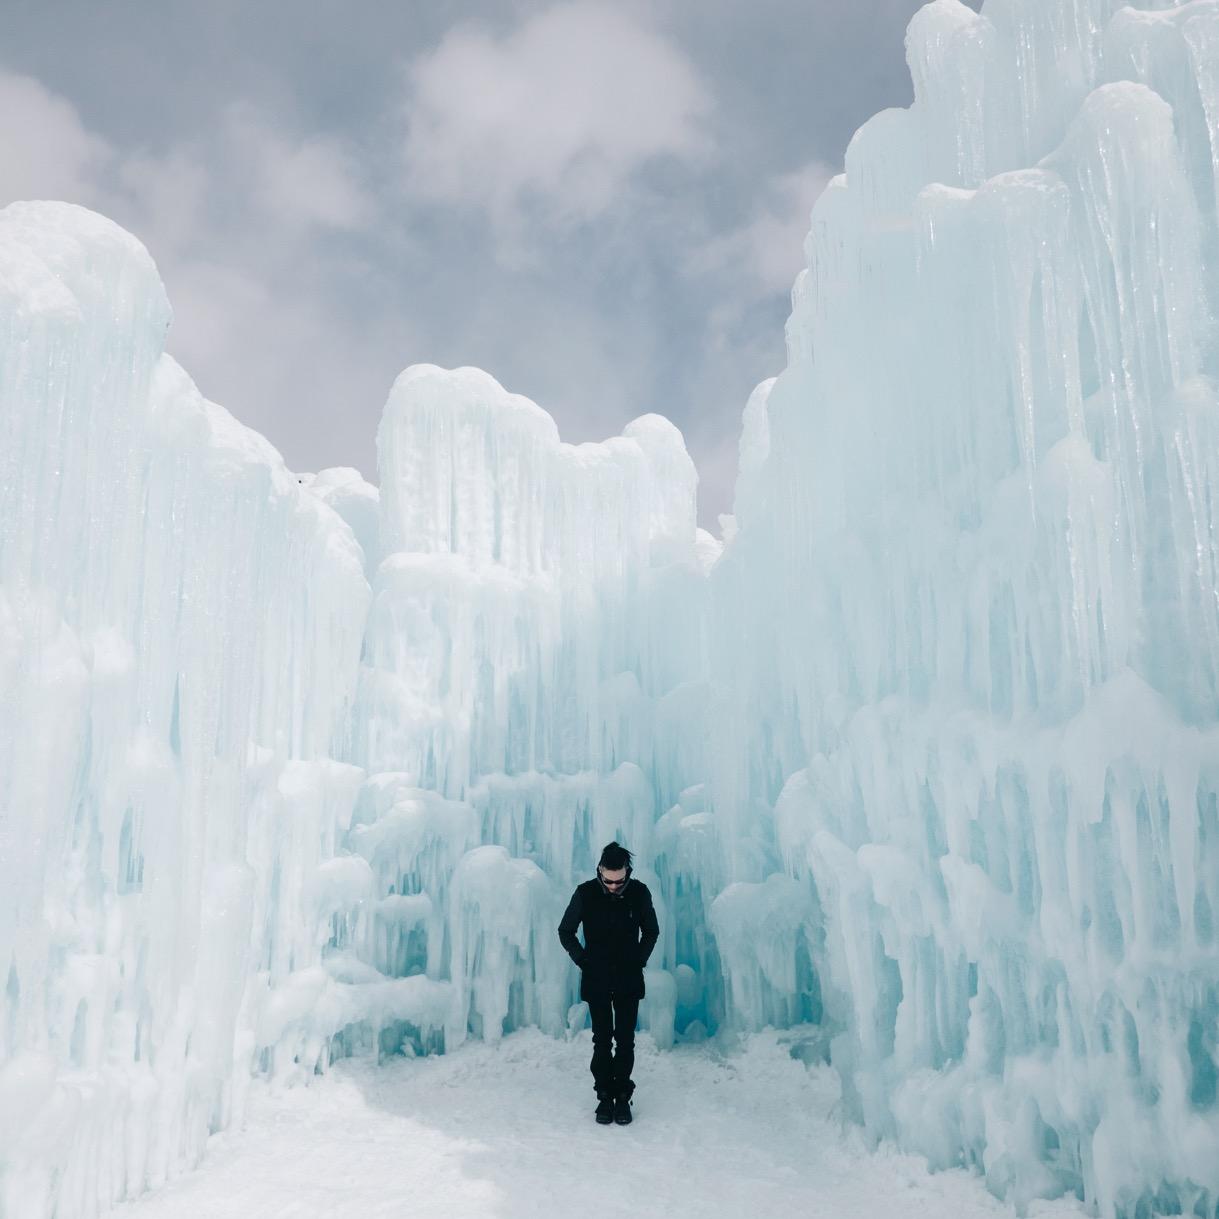 ice_castles4_square.jpg